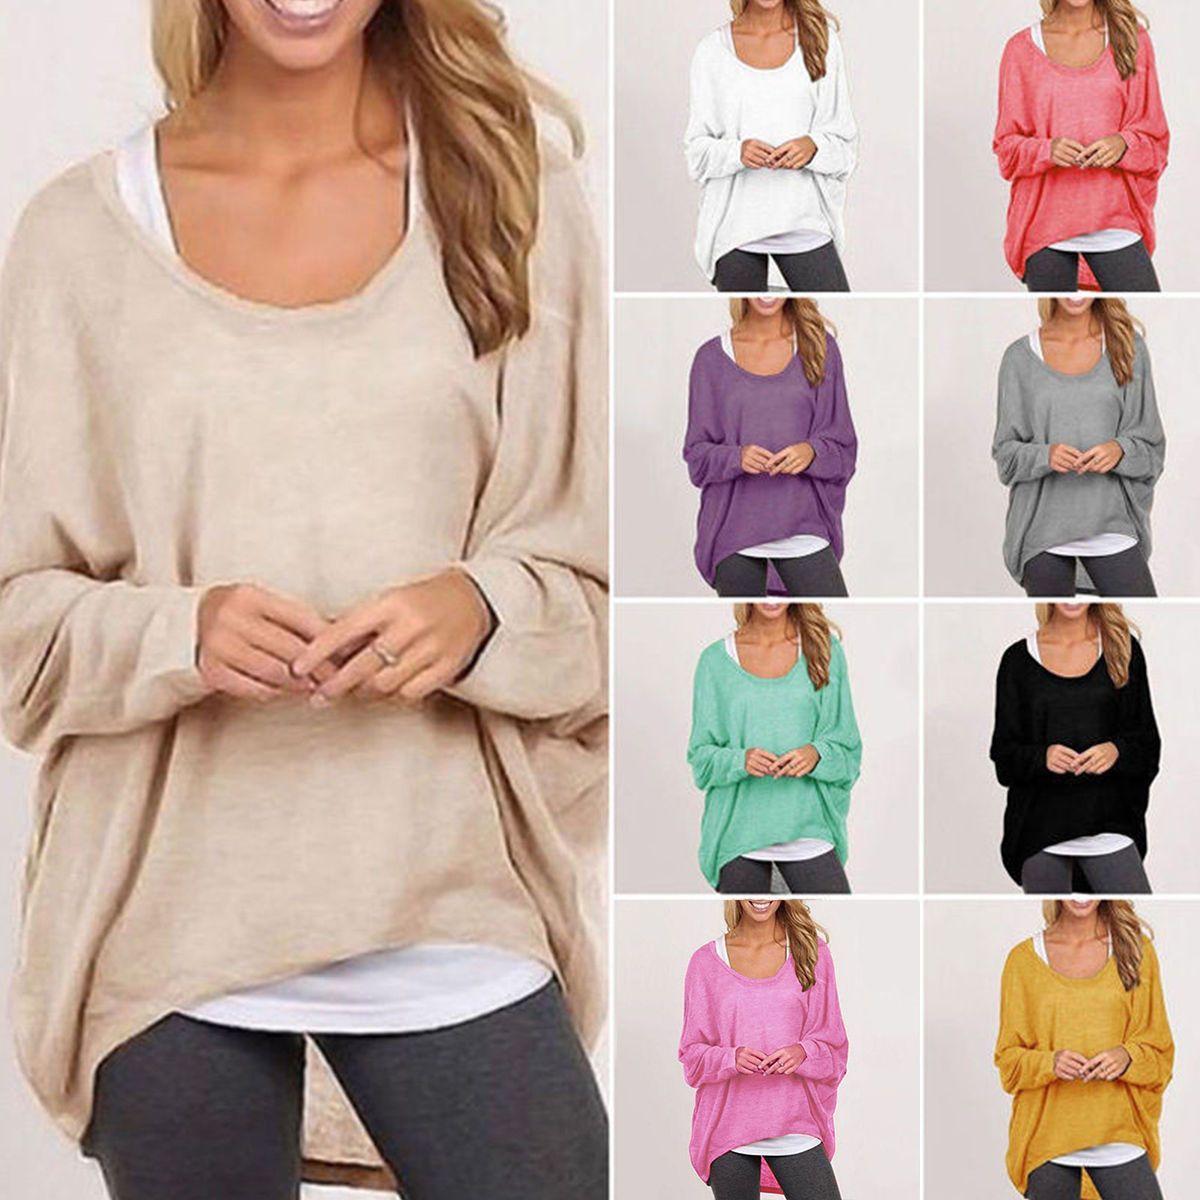 635d1cd898d3 Oversized Women Ladies Loose Long Sleeve Shirt Blouse Baggy Pullover Tops  Jumper